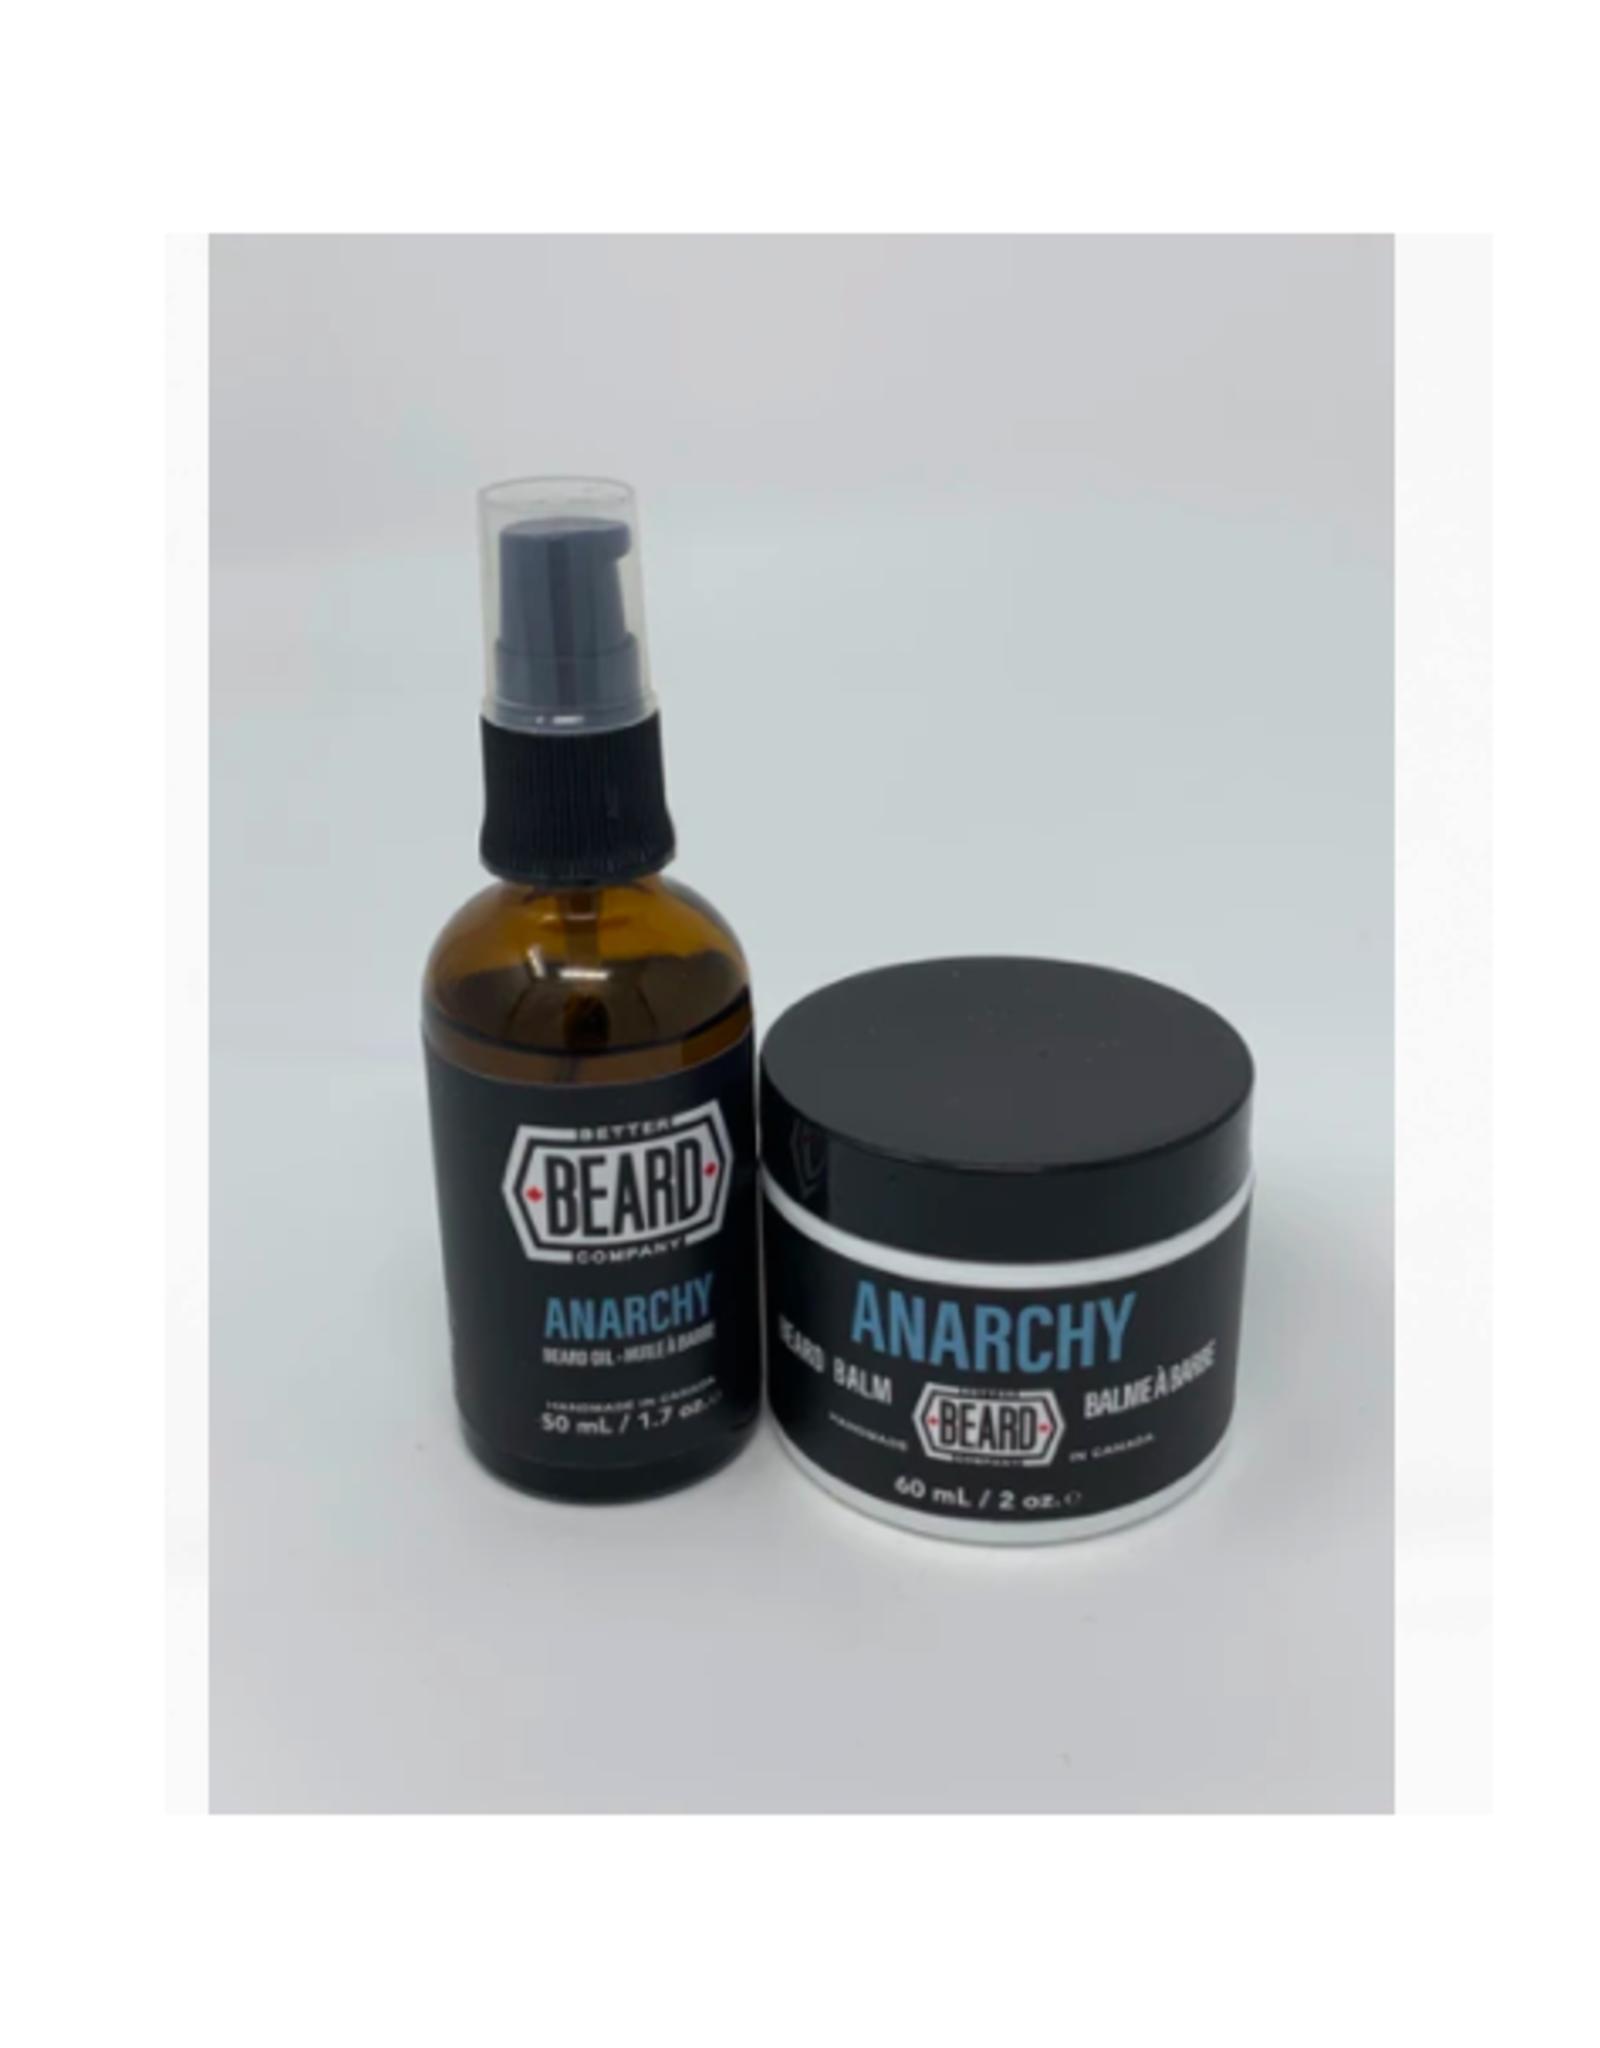 Better Beard Co. - Beard Oil/Anarchy 1.7oz